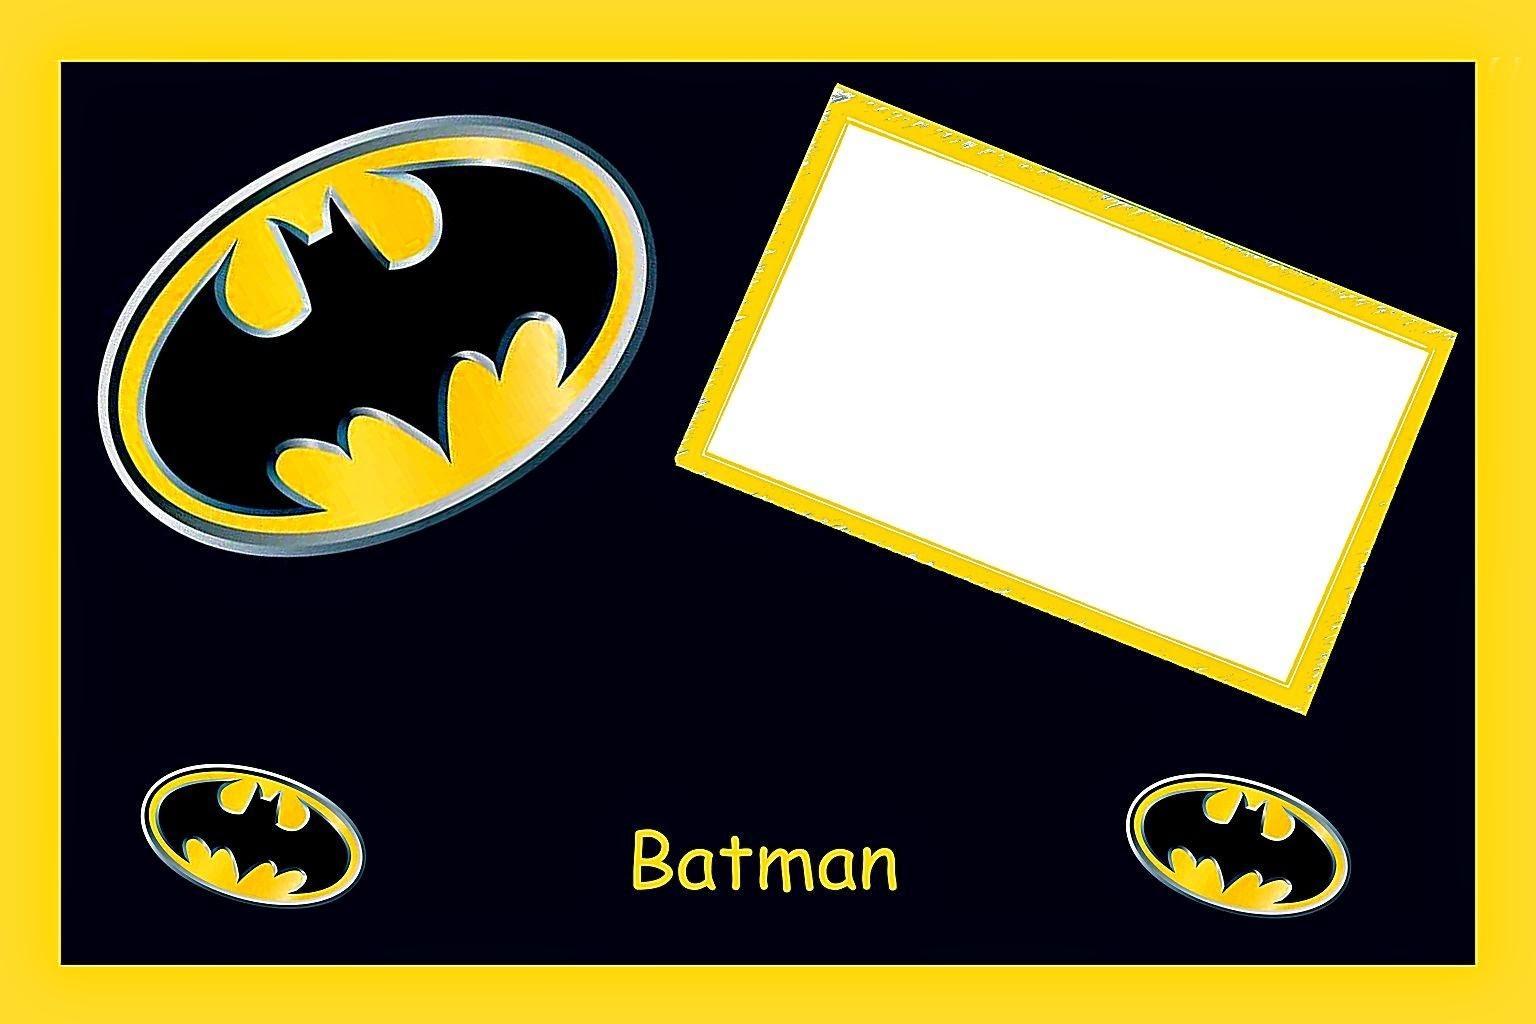 Batman Birthday: Free Printable Cards Or Invitations. - Oh My Fiesta - Free Printable Dr Who Birthday Card